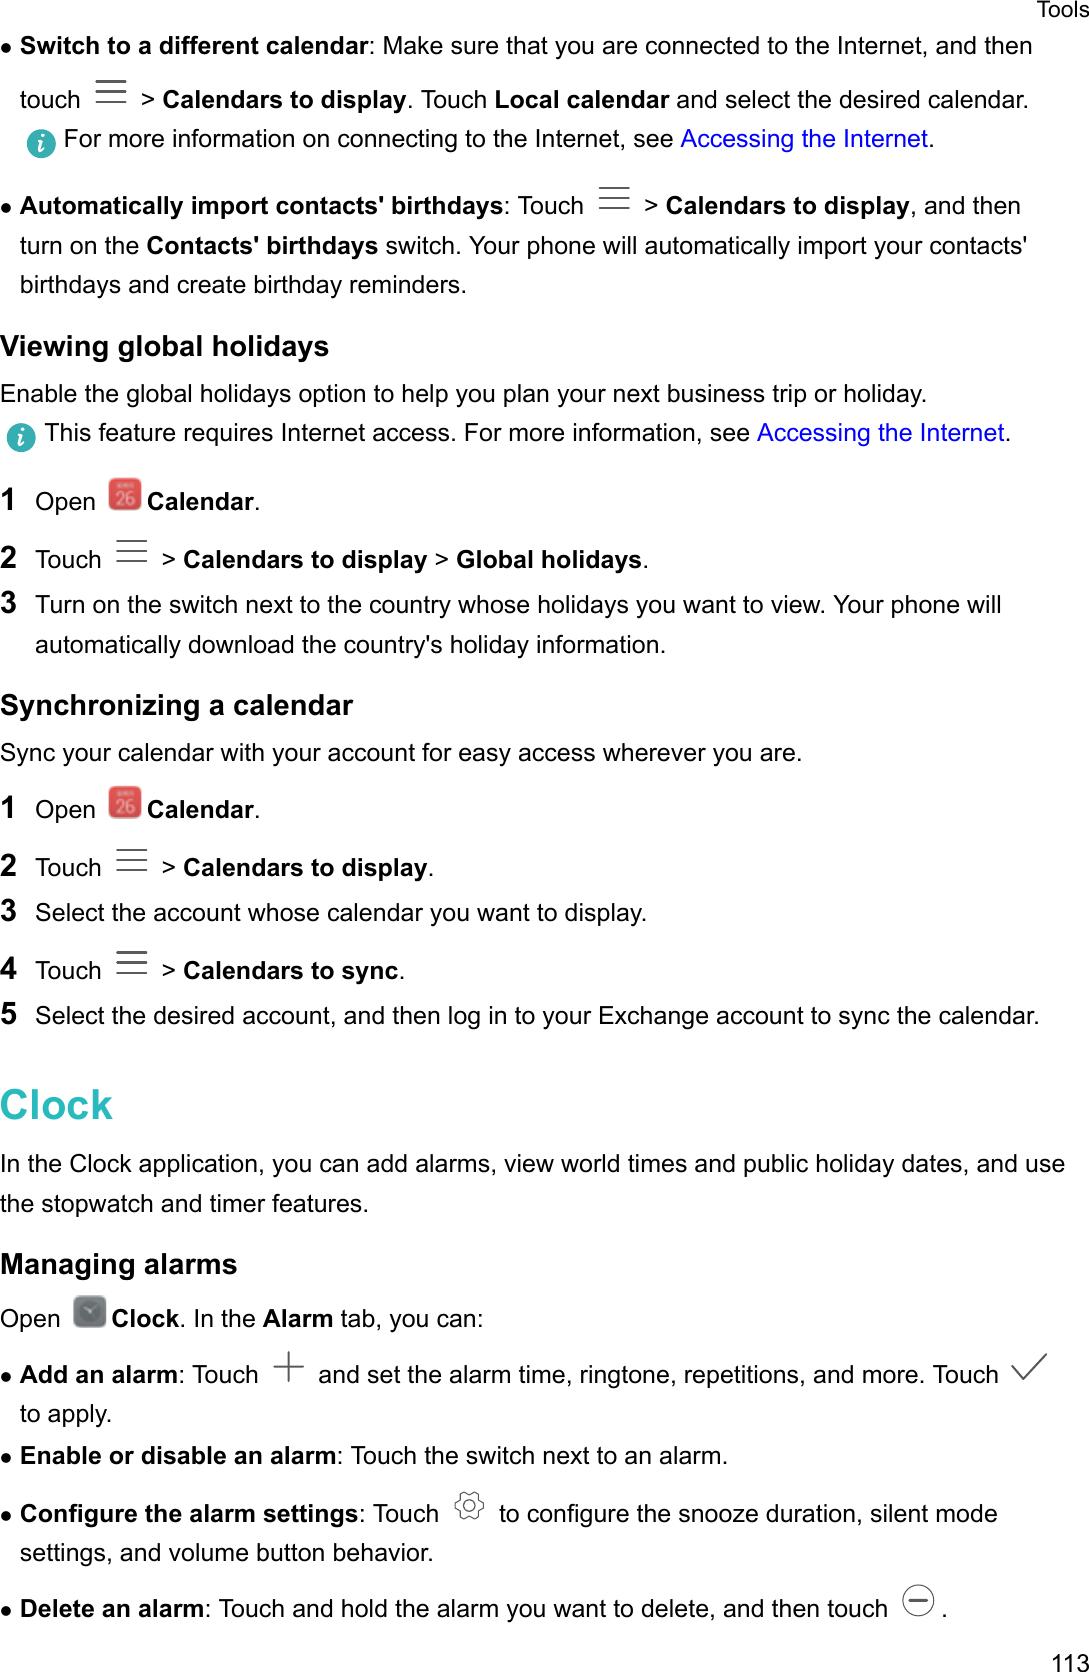 Huawei GR5 2017 User Guide (BLL L22&BLL L21, 02, English)